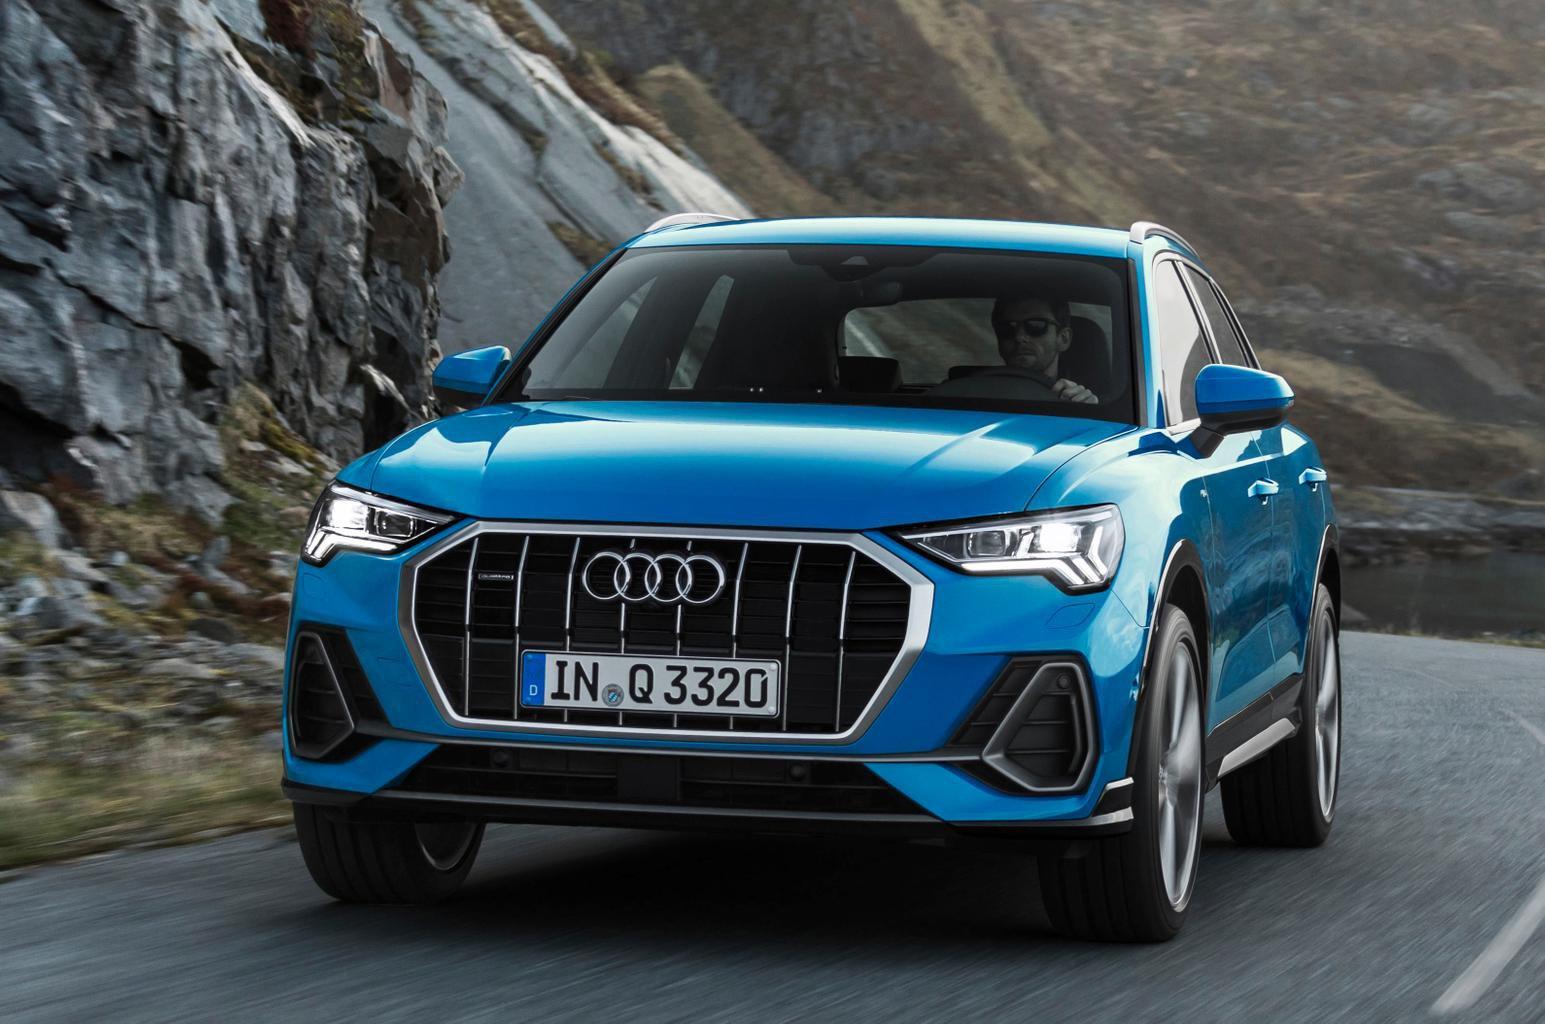 Audi Q3 2018 Release Date >> 2018 Audi Q3 Price Specs And Release Date What Car